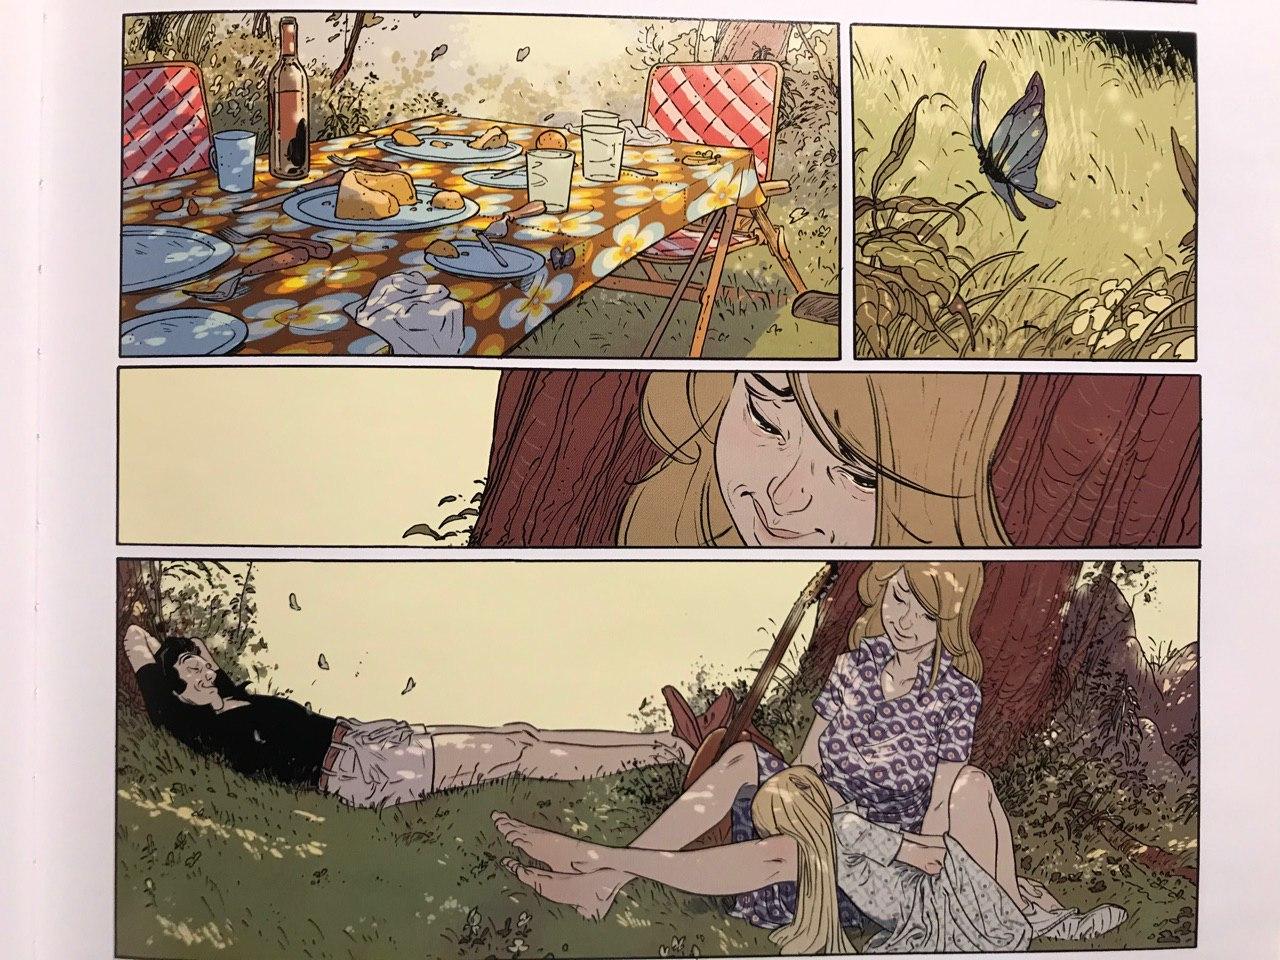 Golem-Comics-resena-los-buenos-veranos-07